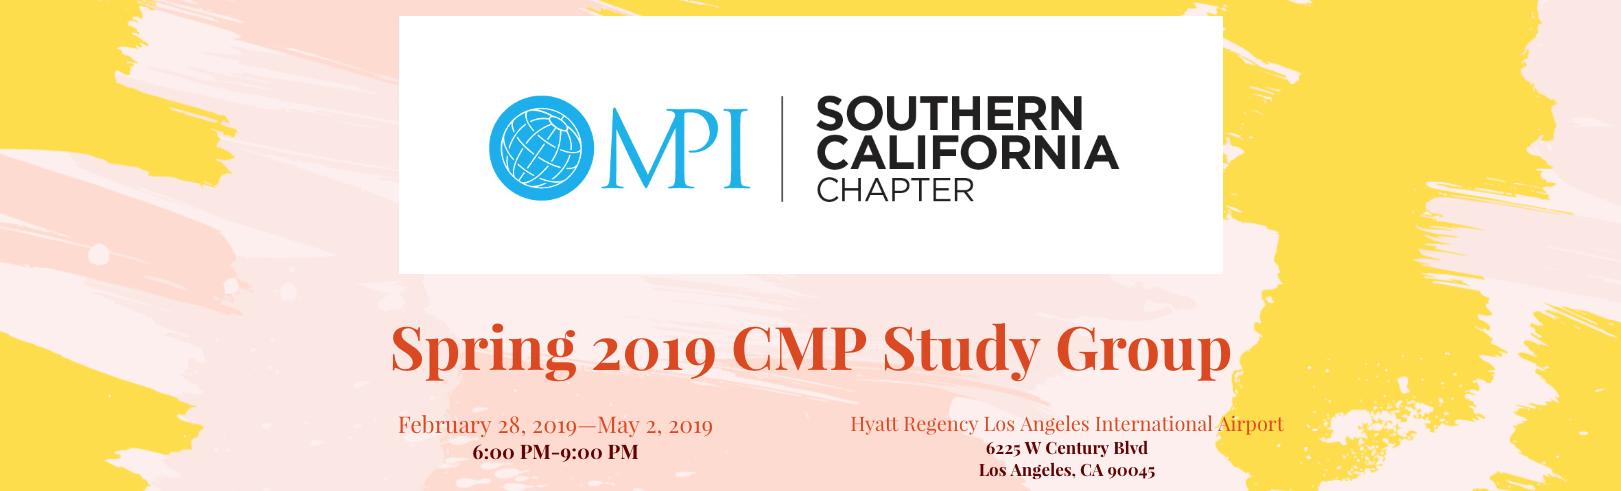 mpi study group.png